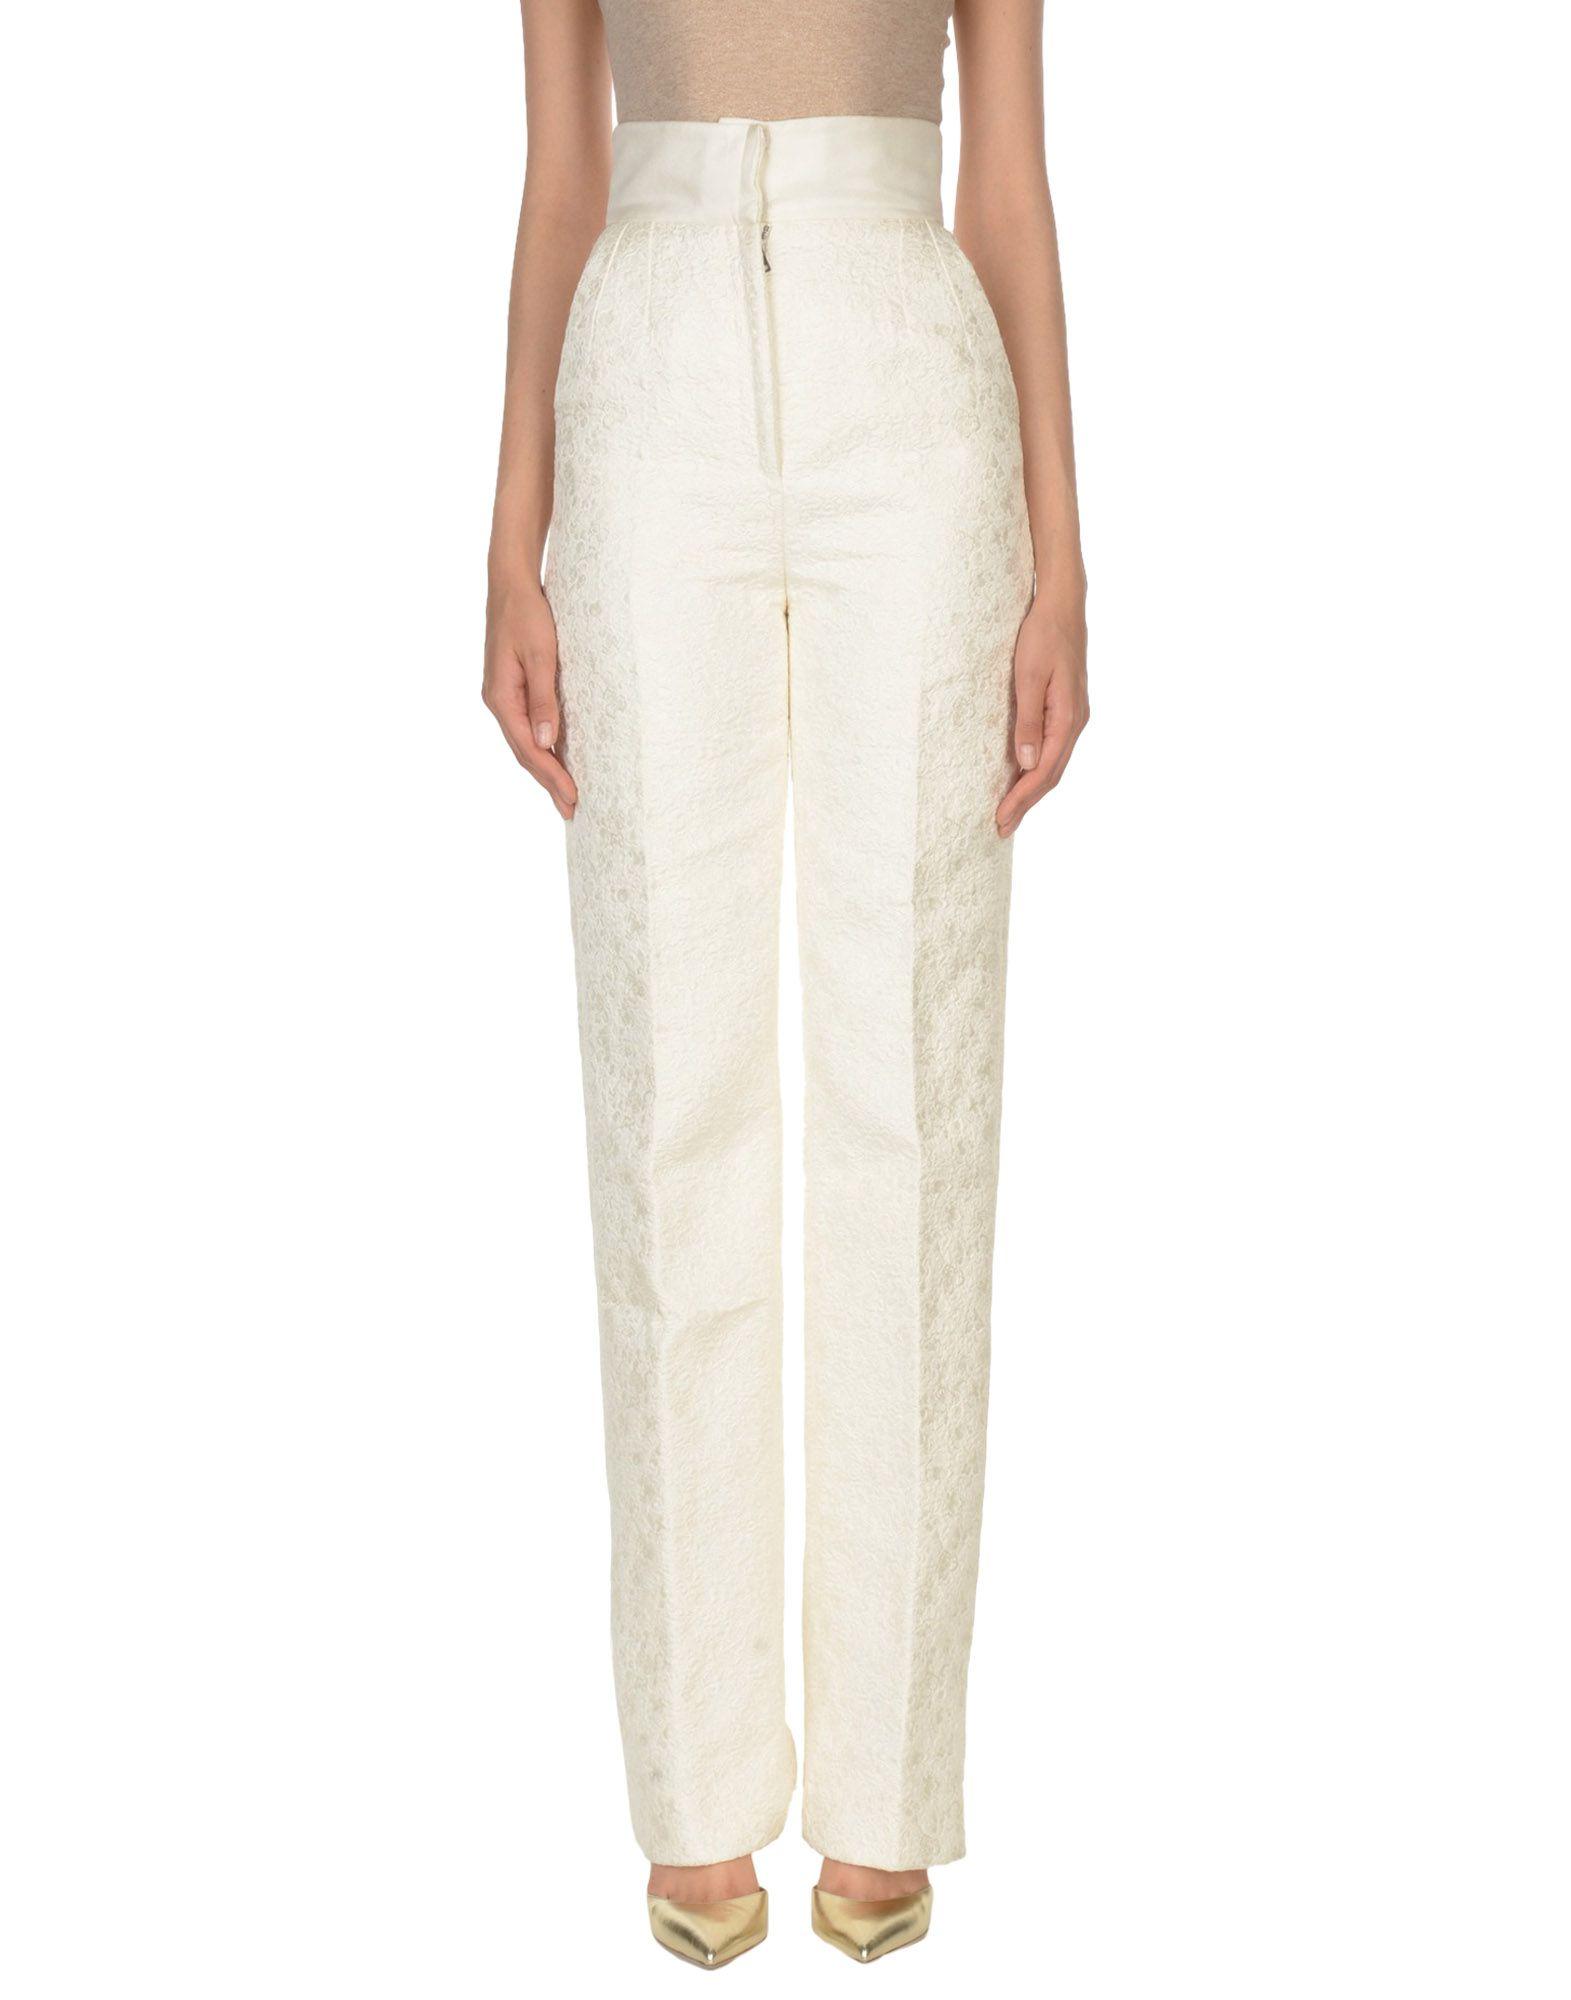 Pantalone Dolce & Gabbana Donna - Acquista online su zKQKg7c